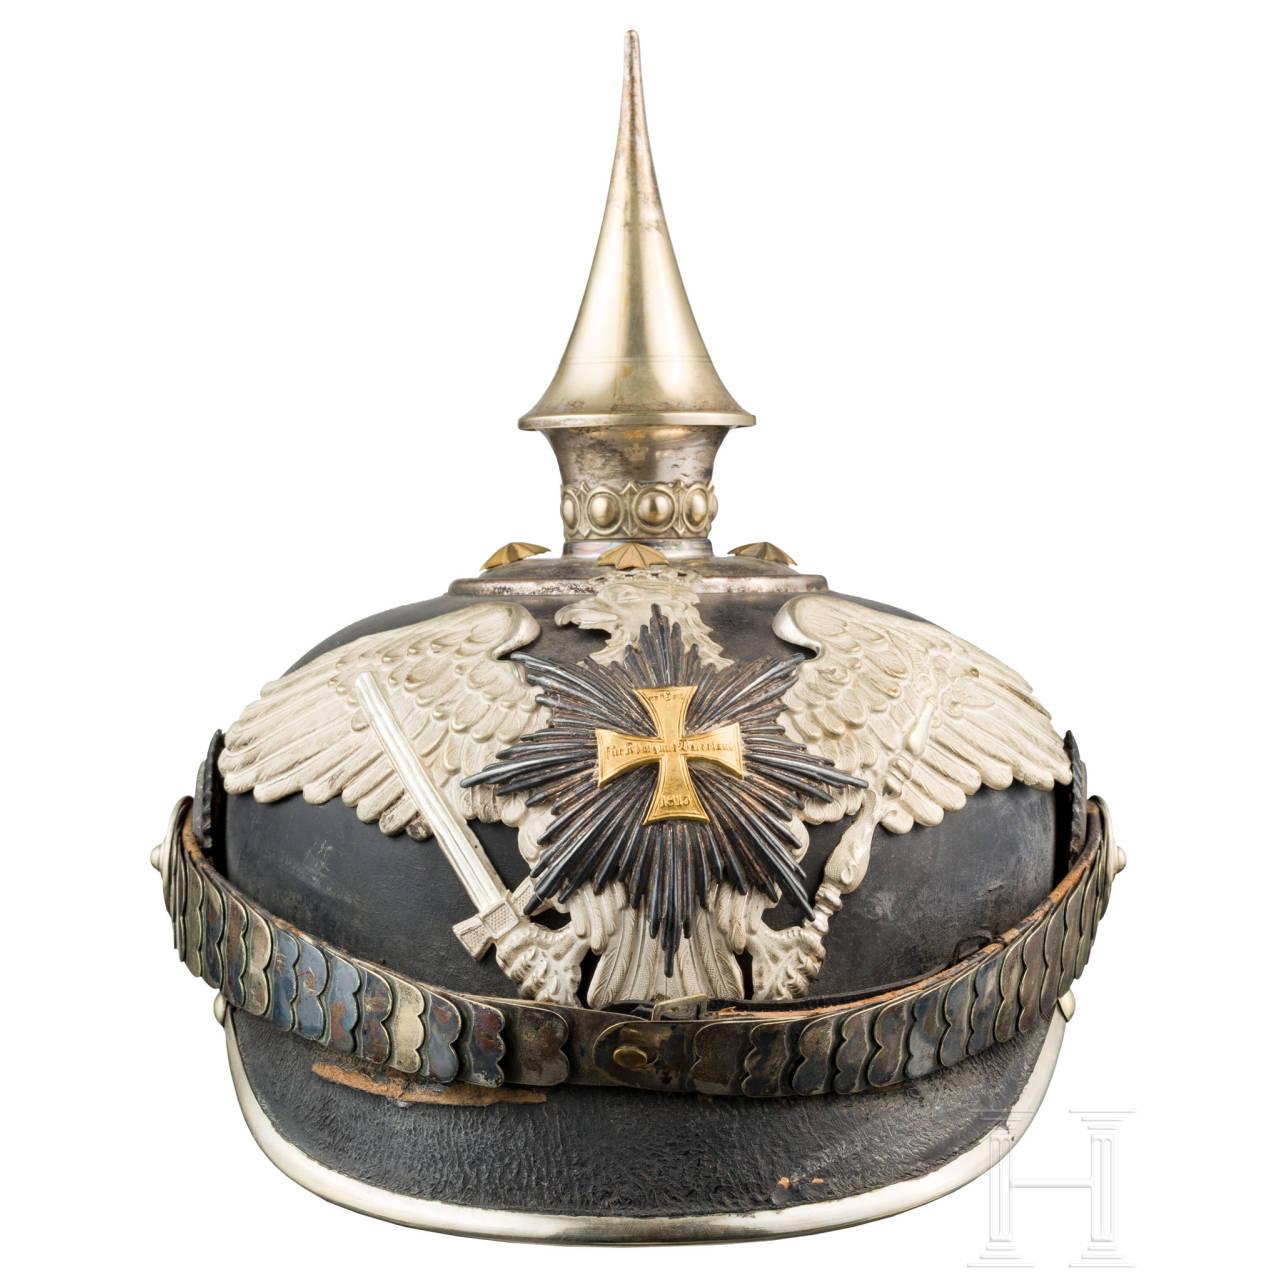 A helmet for officers of the Garde-Landwehr, ca. 1900